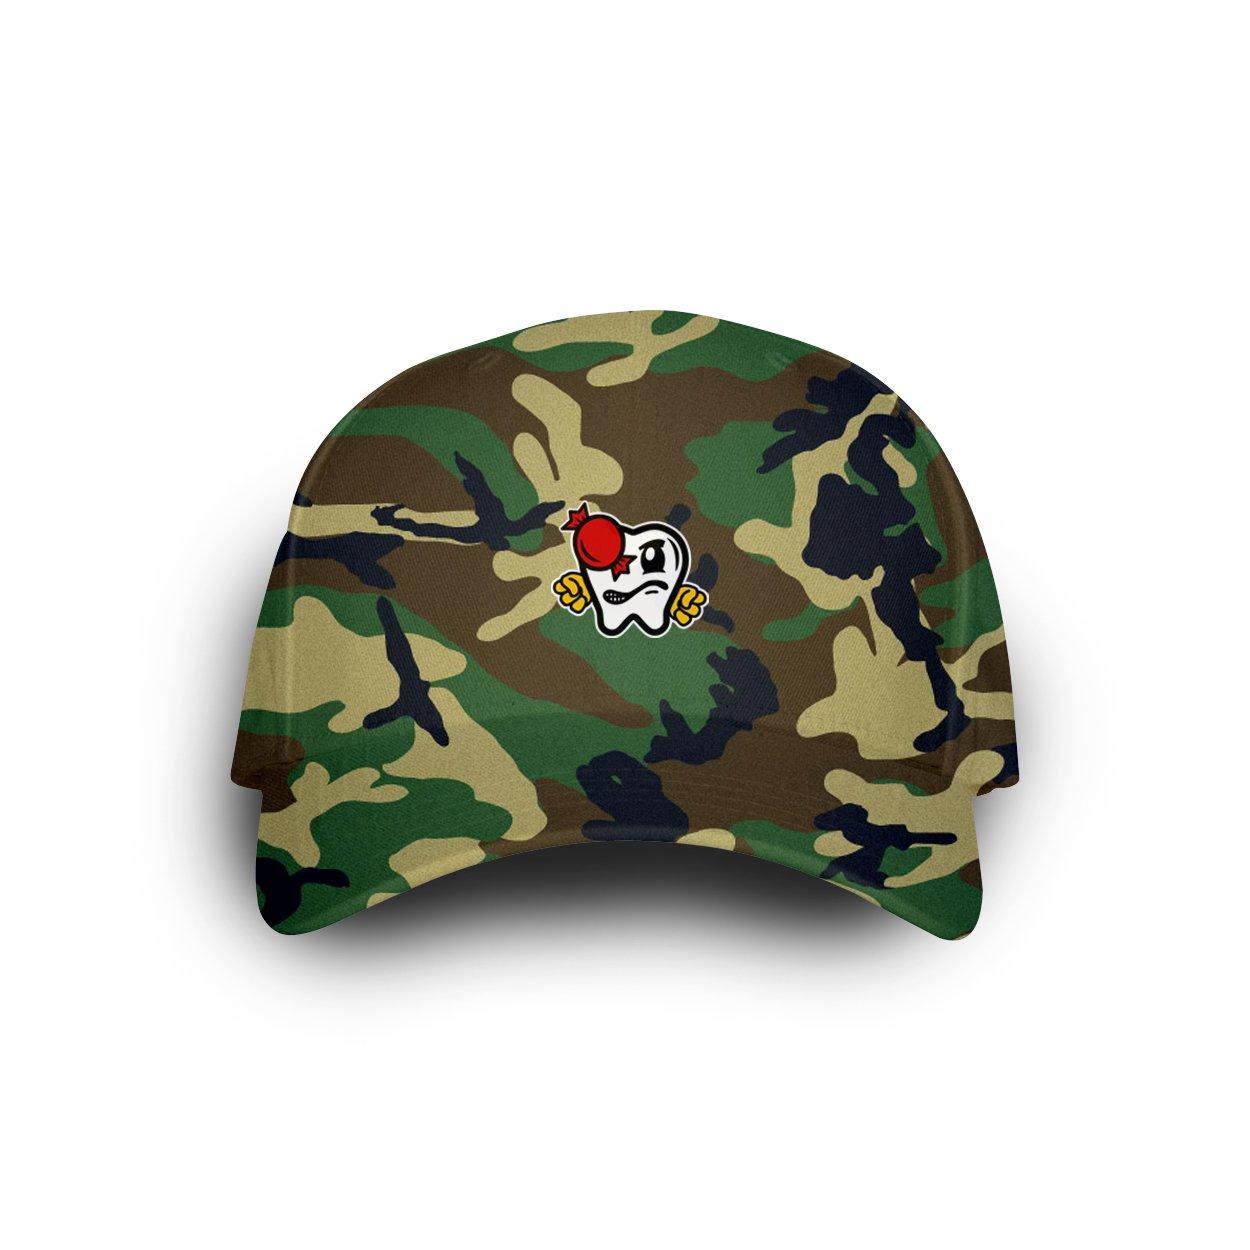 Image of OG VITAS DAD CAP CAMO